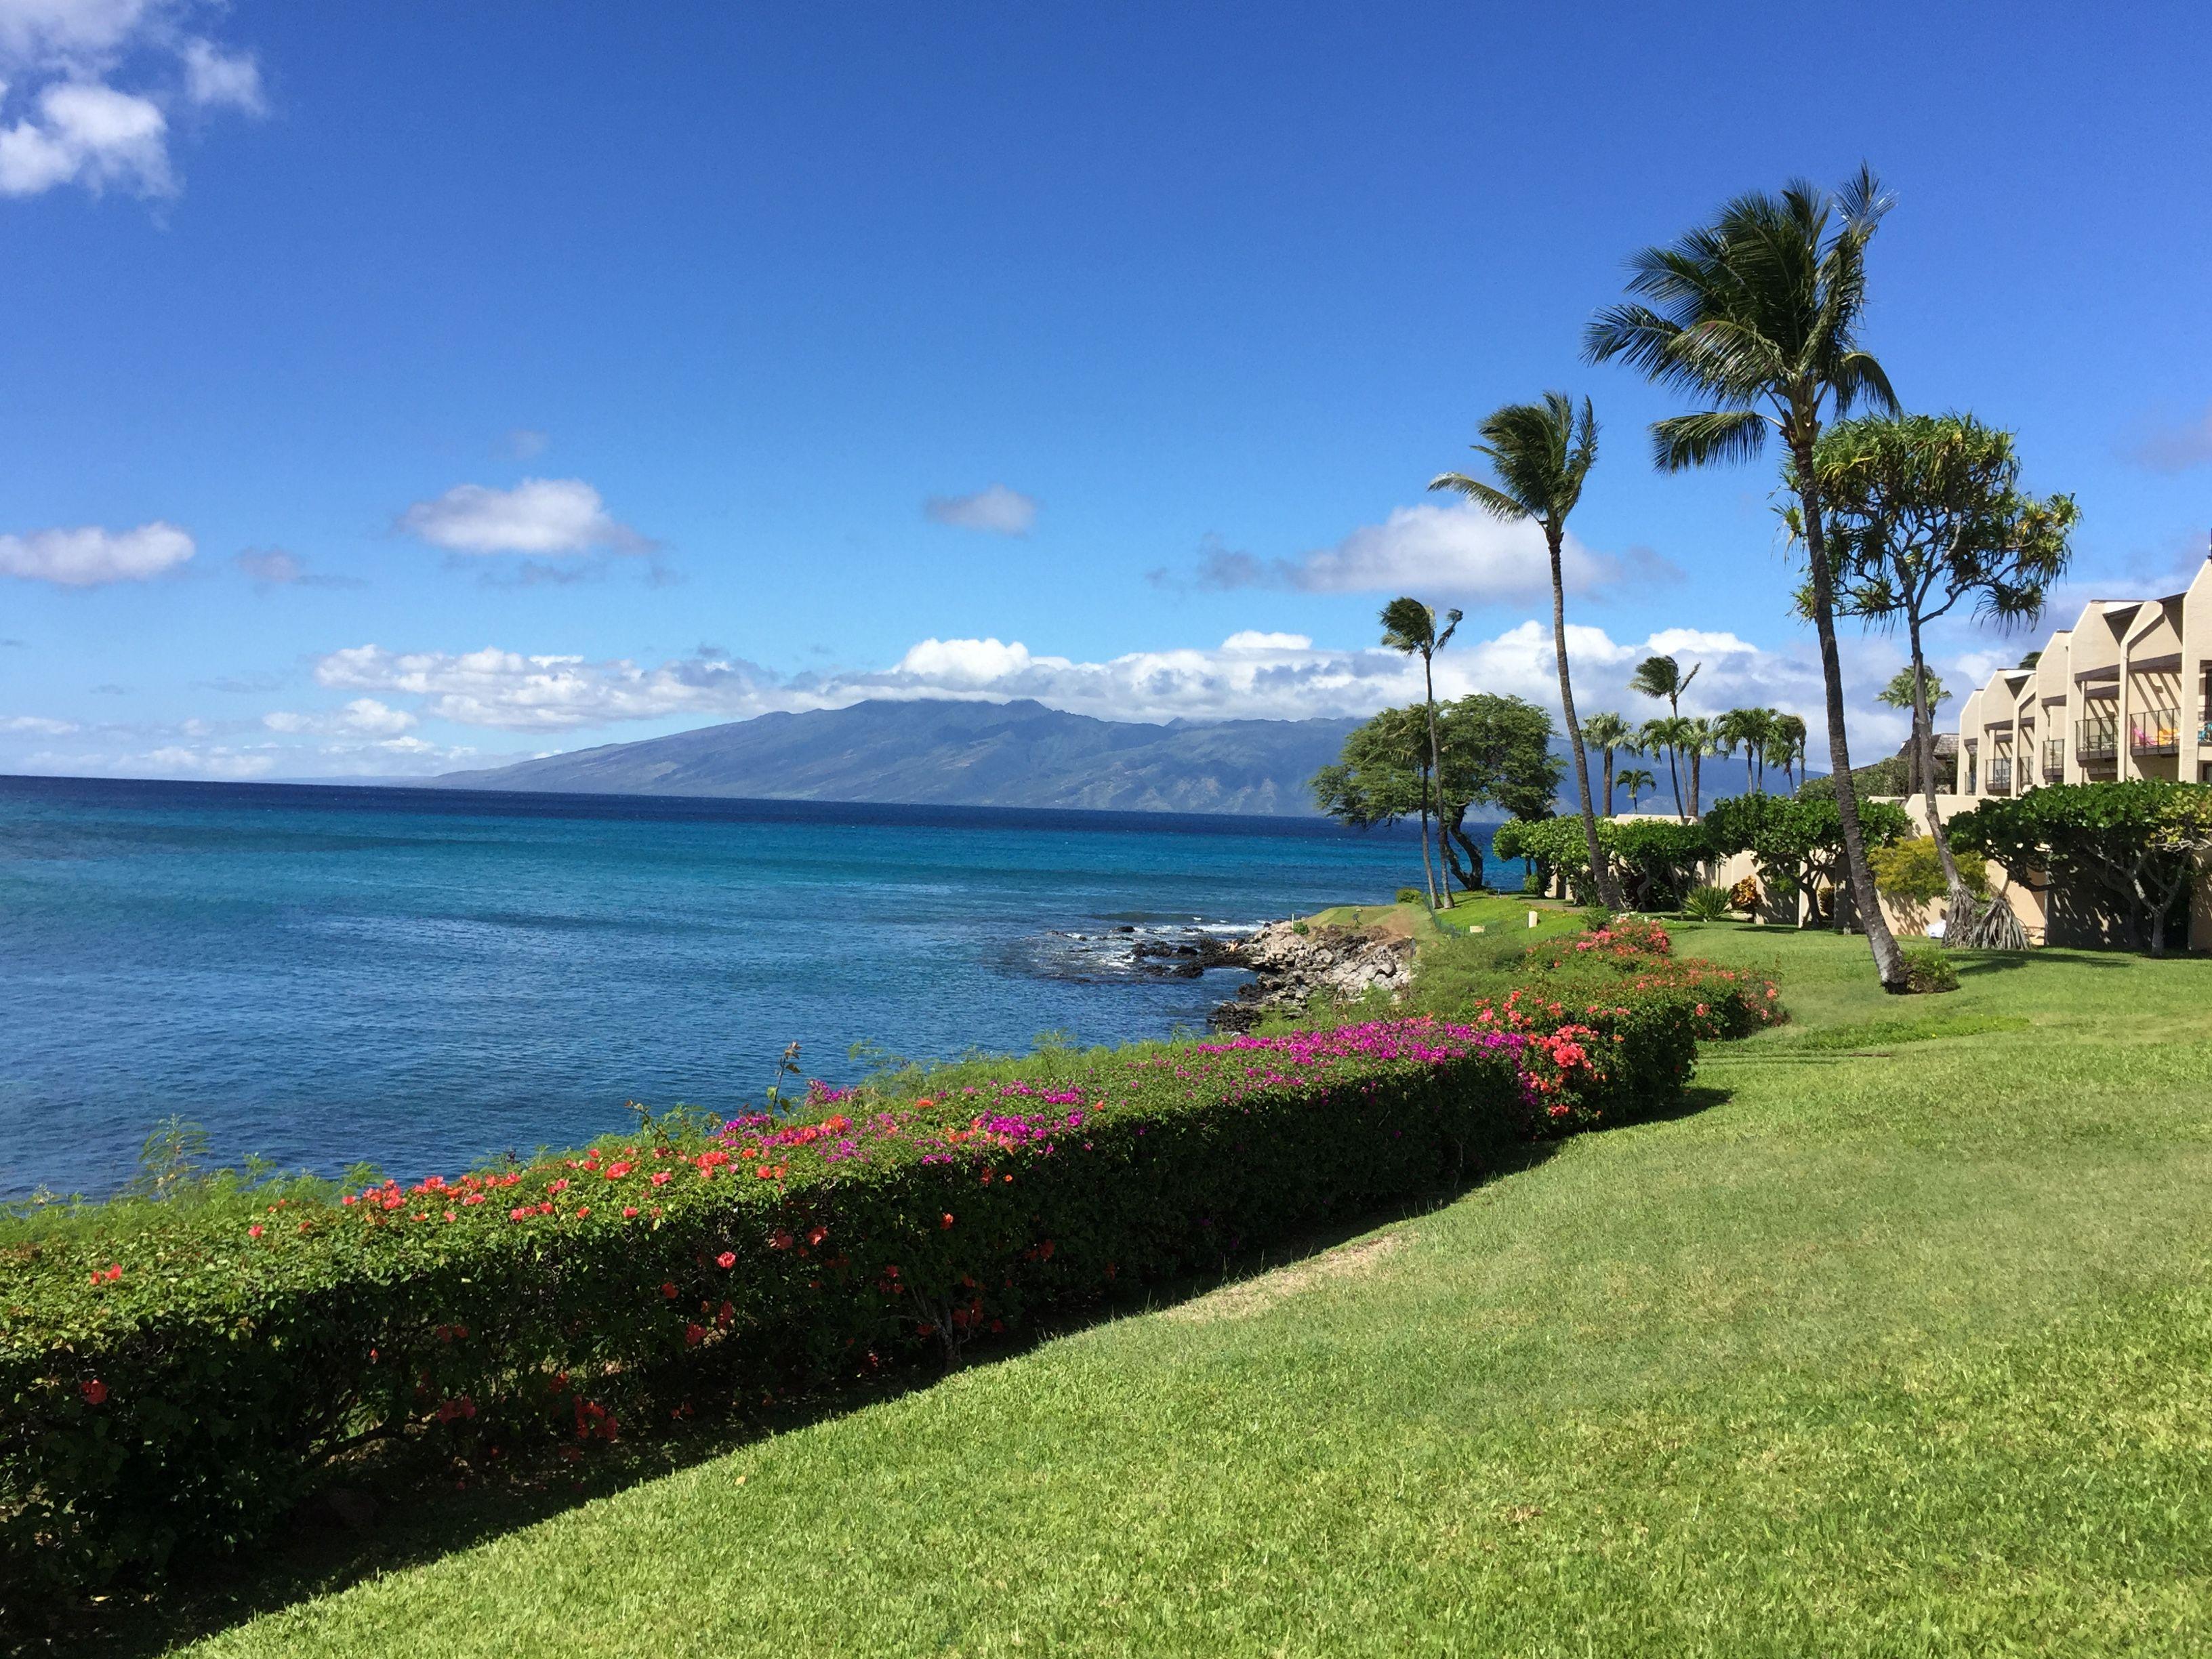 70a1be0f519aa61ca352cde63036f3aa - The Gardens At West Maui Pictures